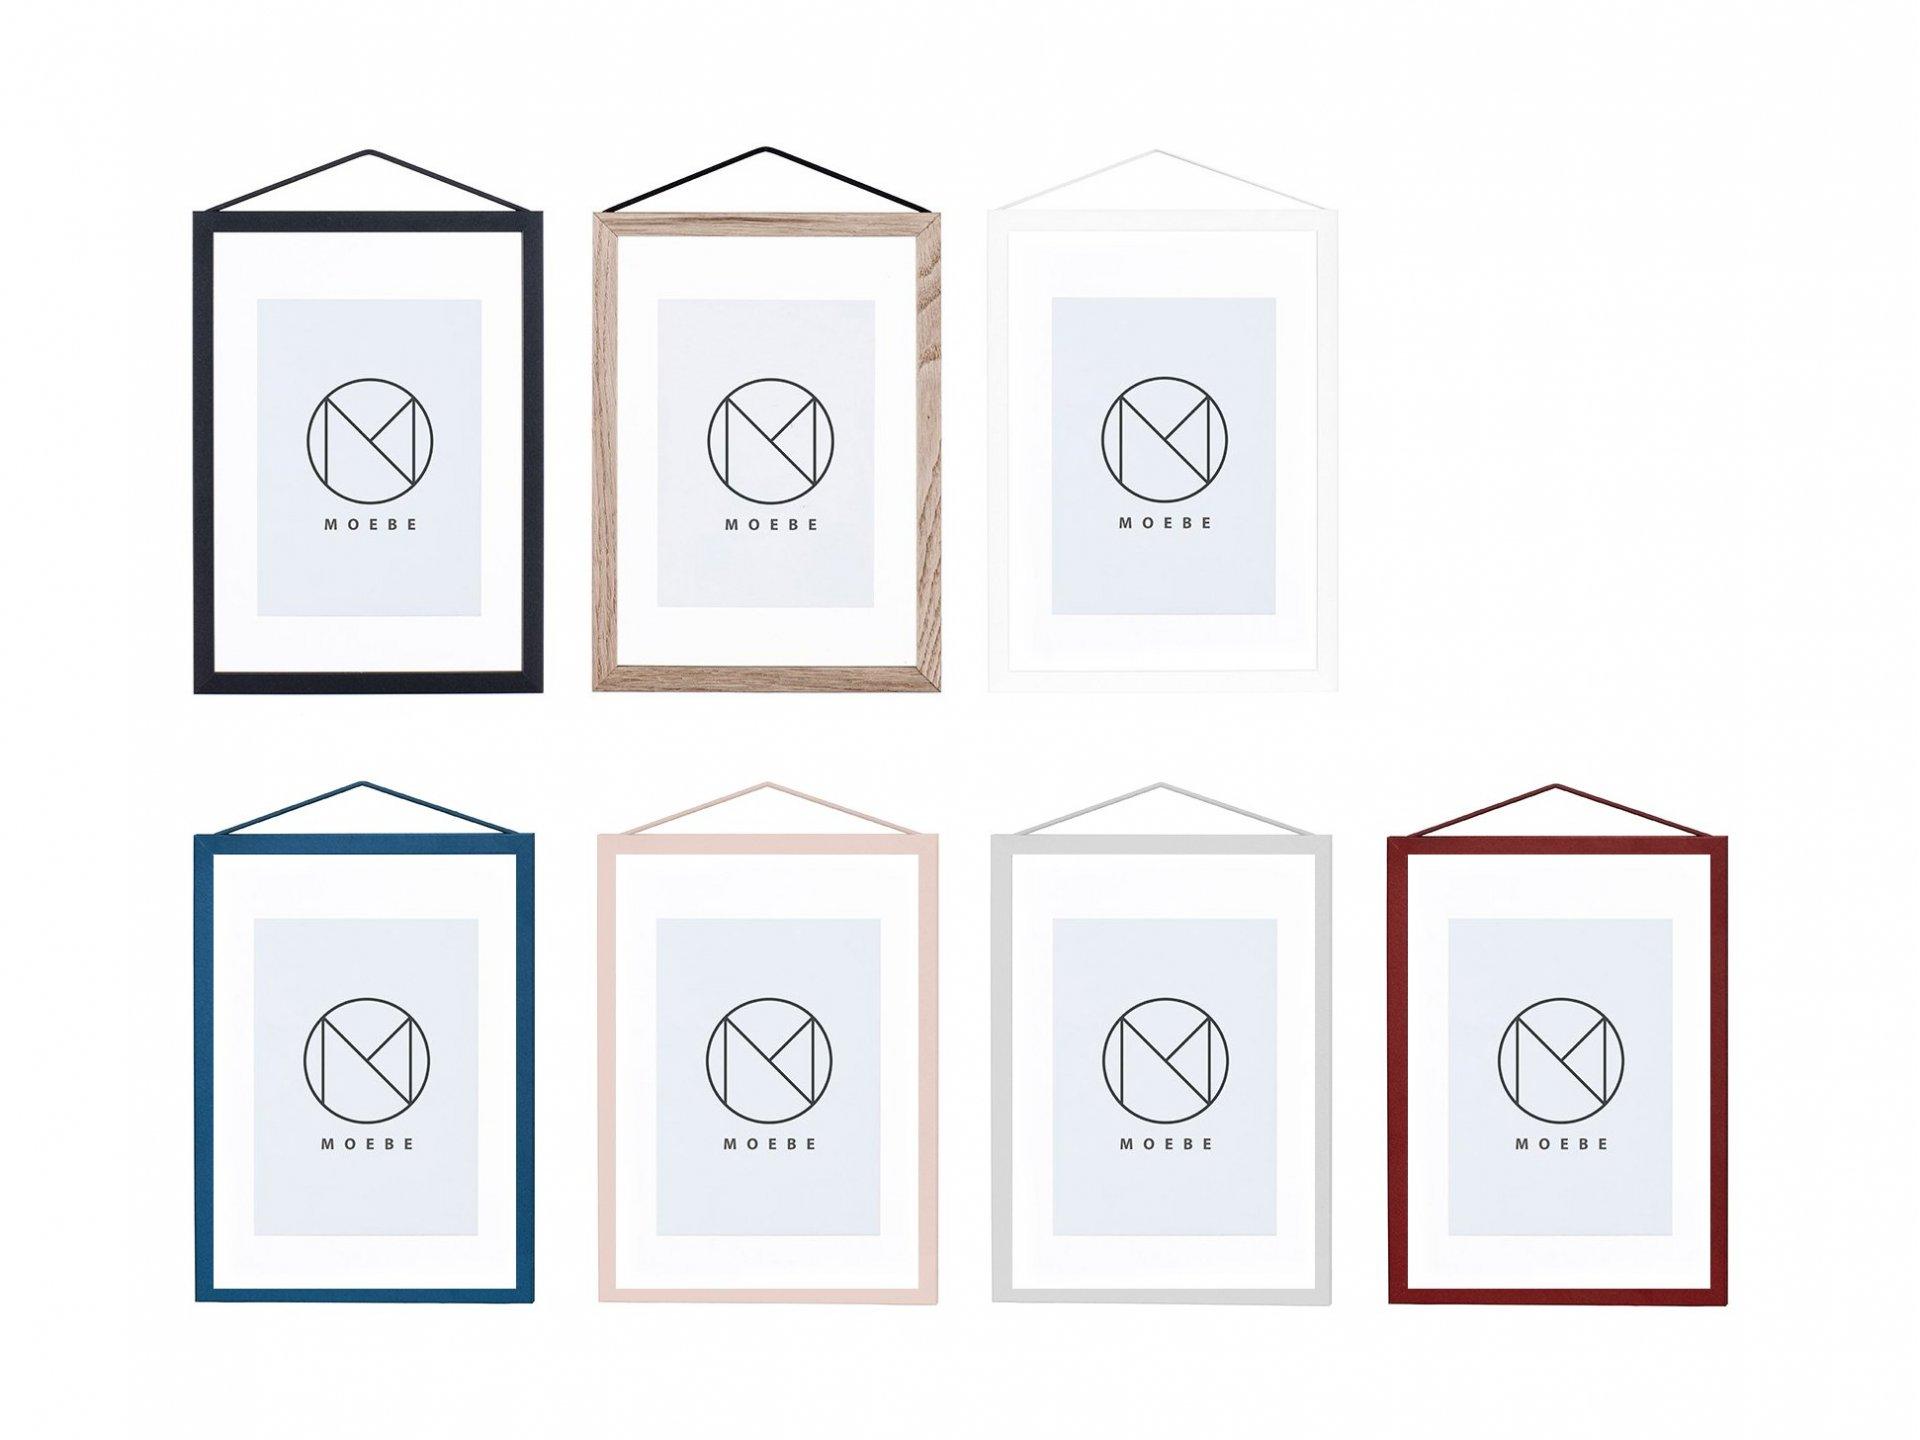 Moebe Rahmen Frame online kaufen | Modulor Online Shop